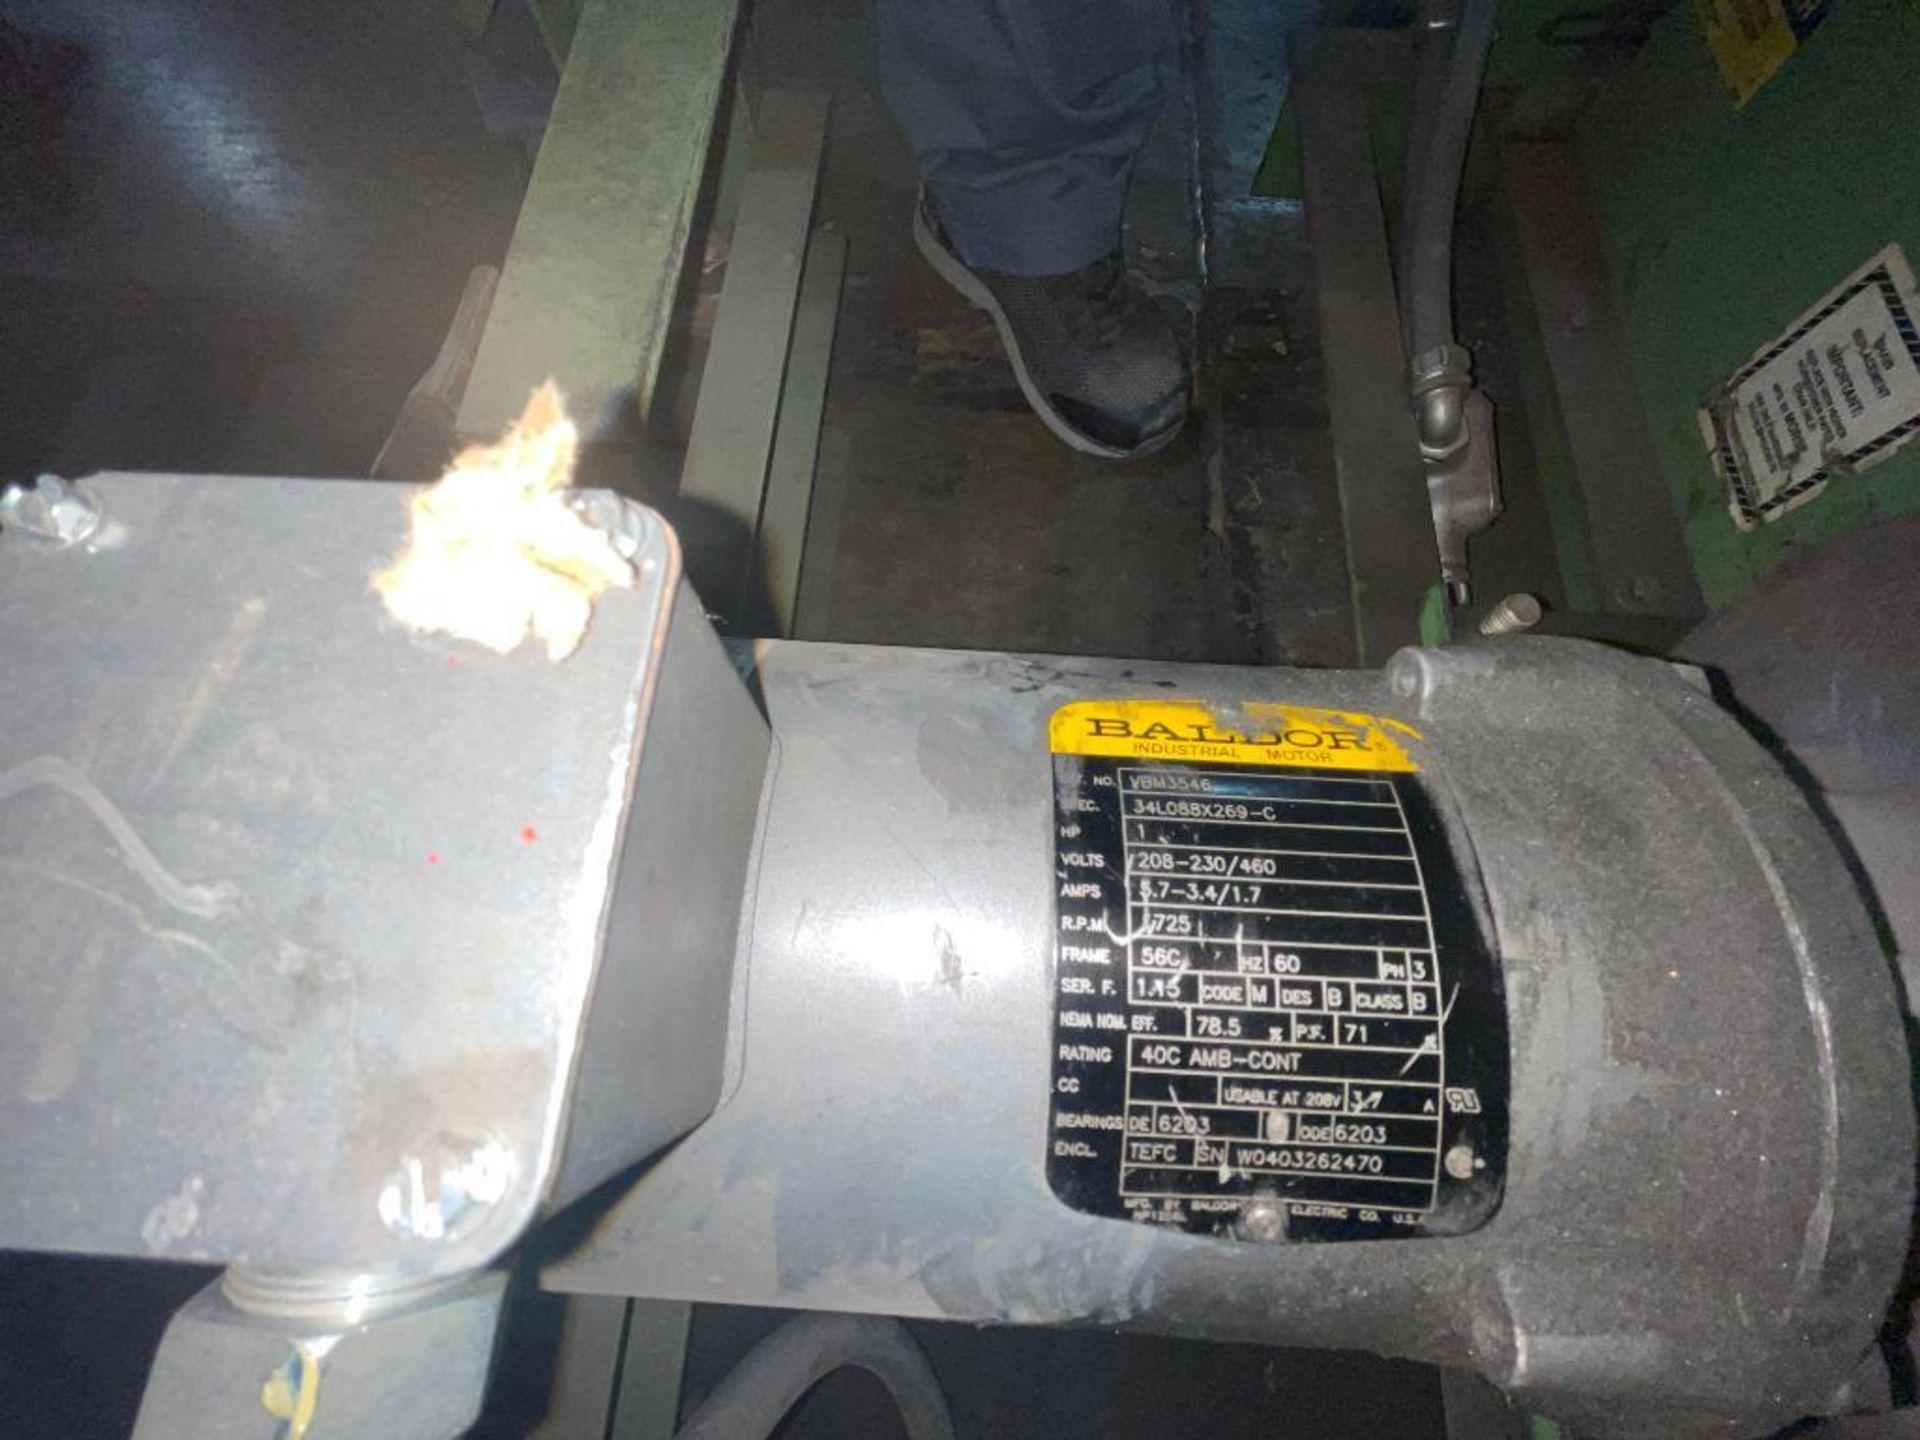 Buschman full pallet conveyor - Image 6 of 12